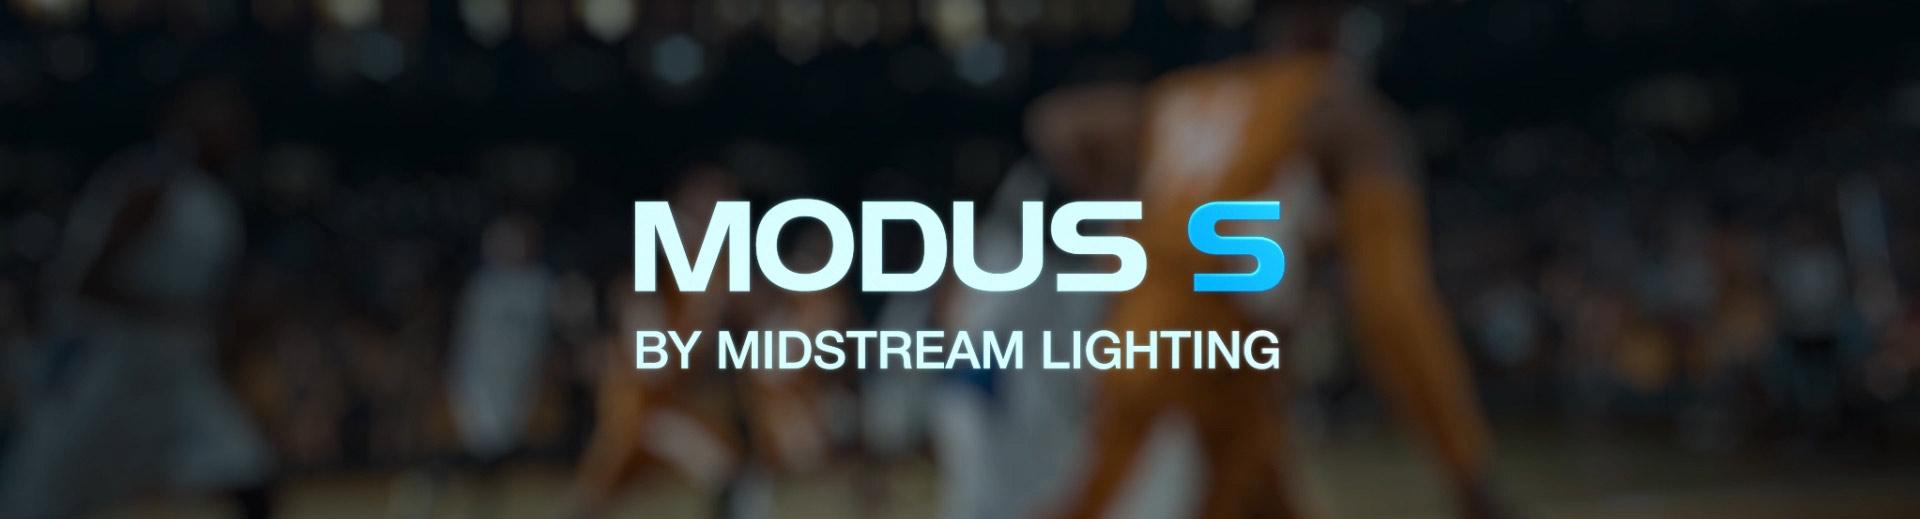 Modus S by Midstream Lighting